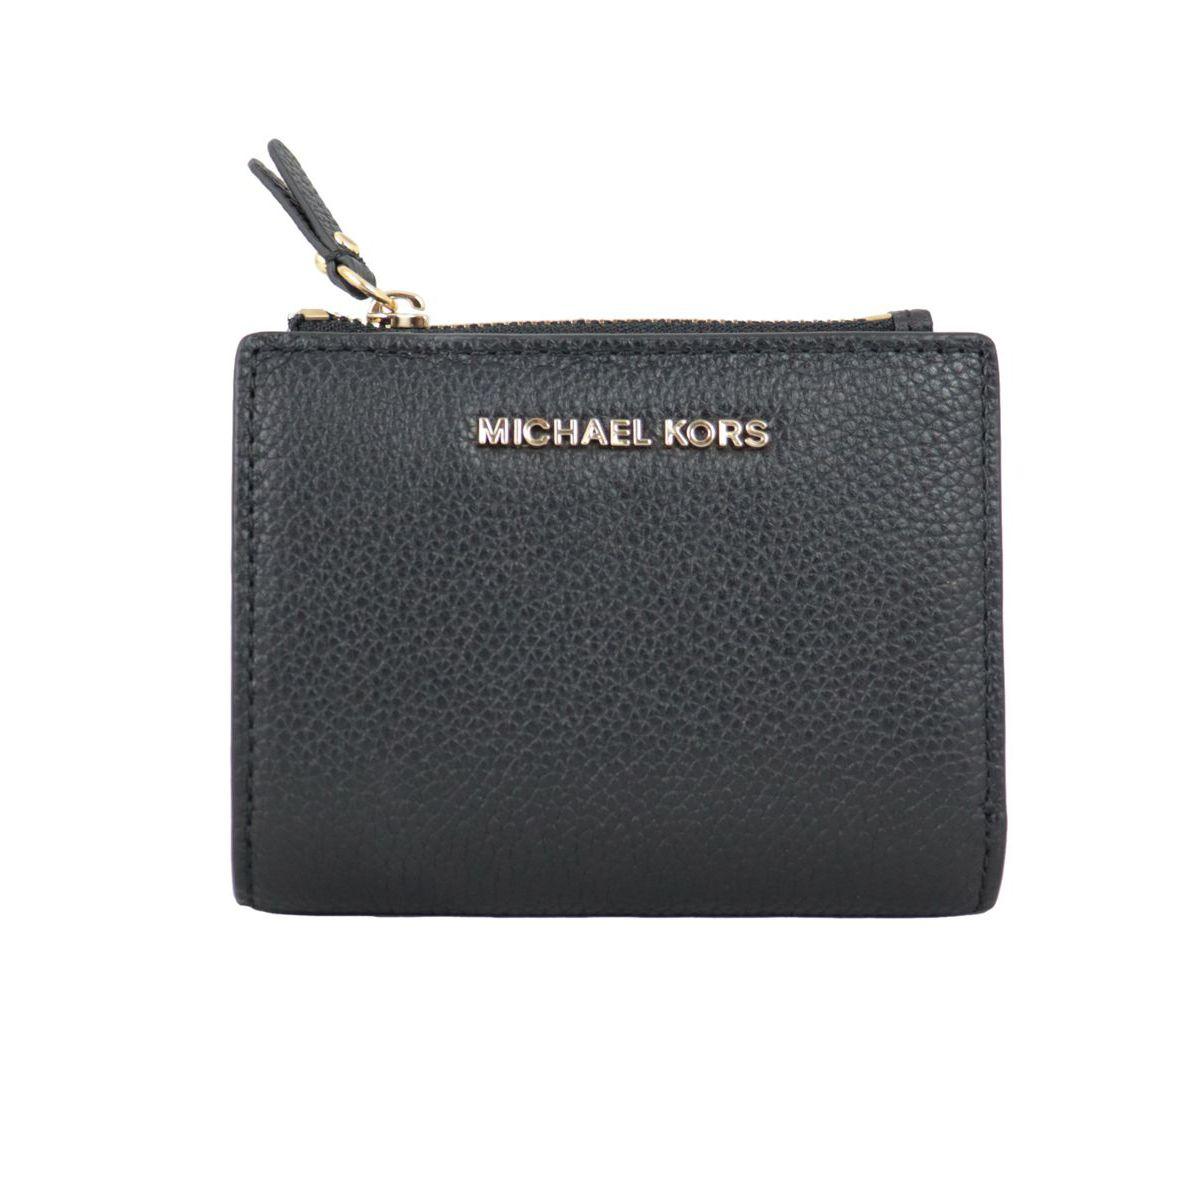 Textured leather wallet with external zipper Black Michael Kors